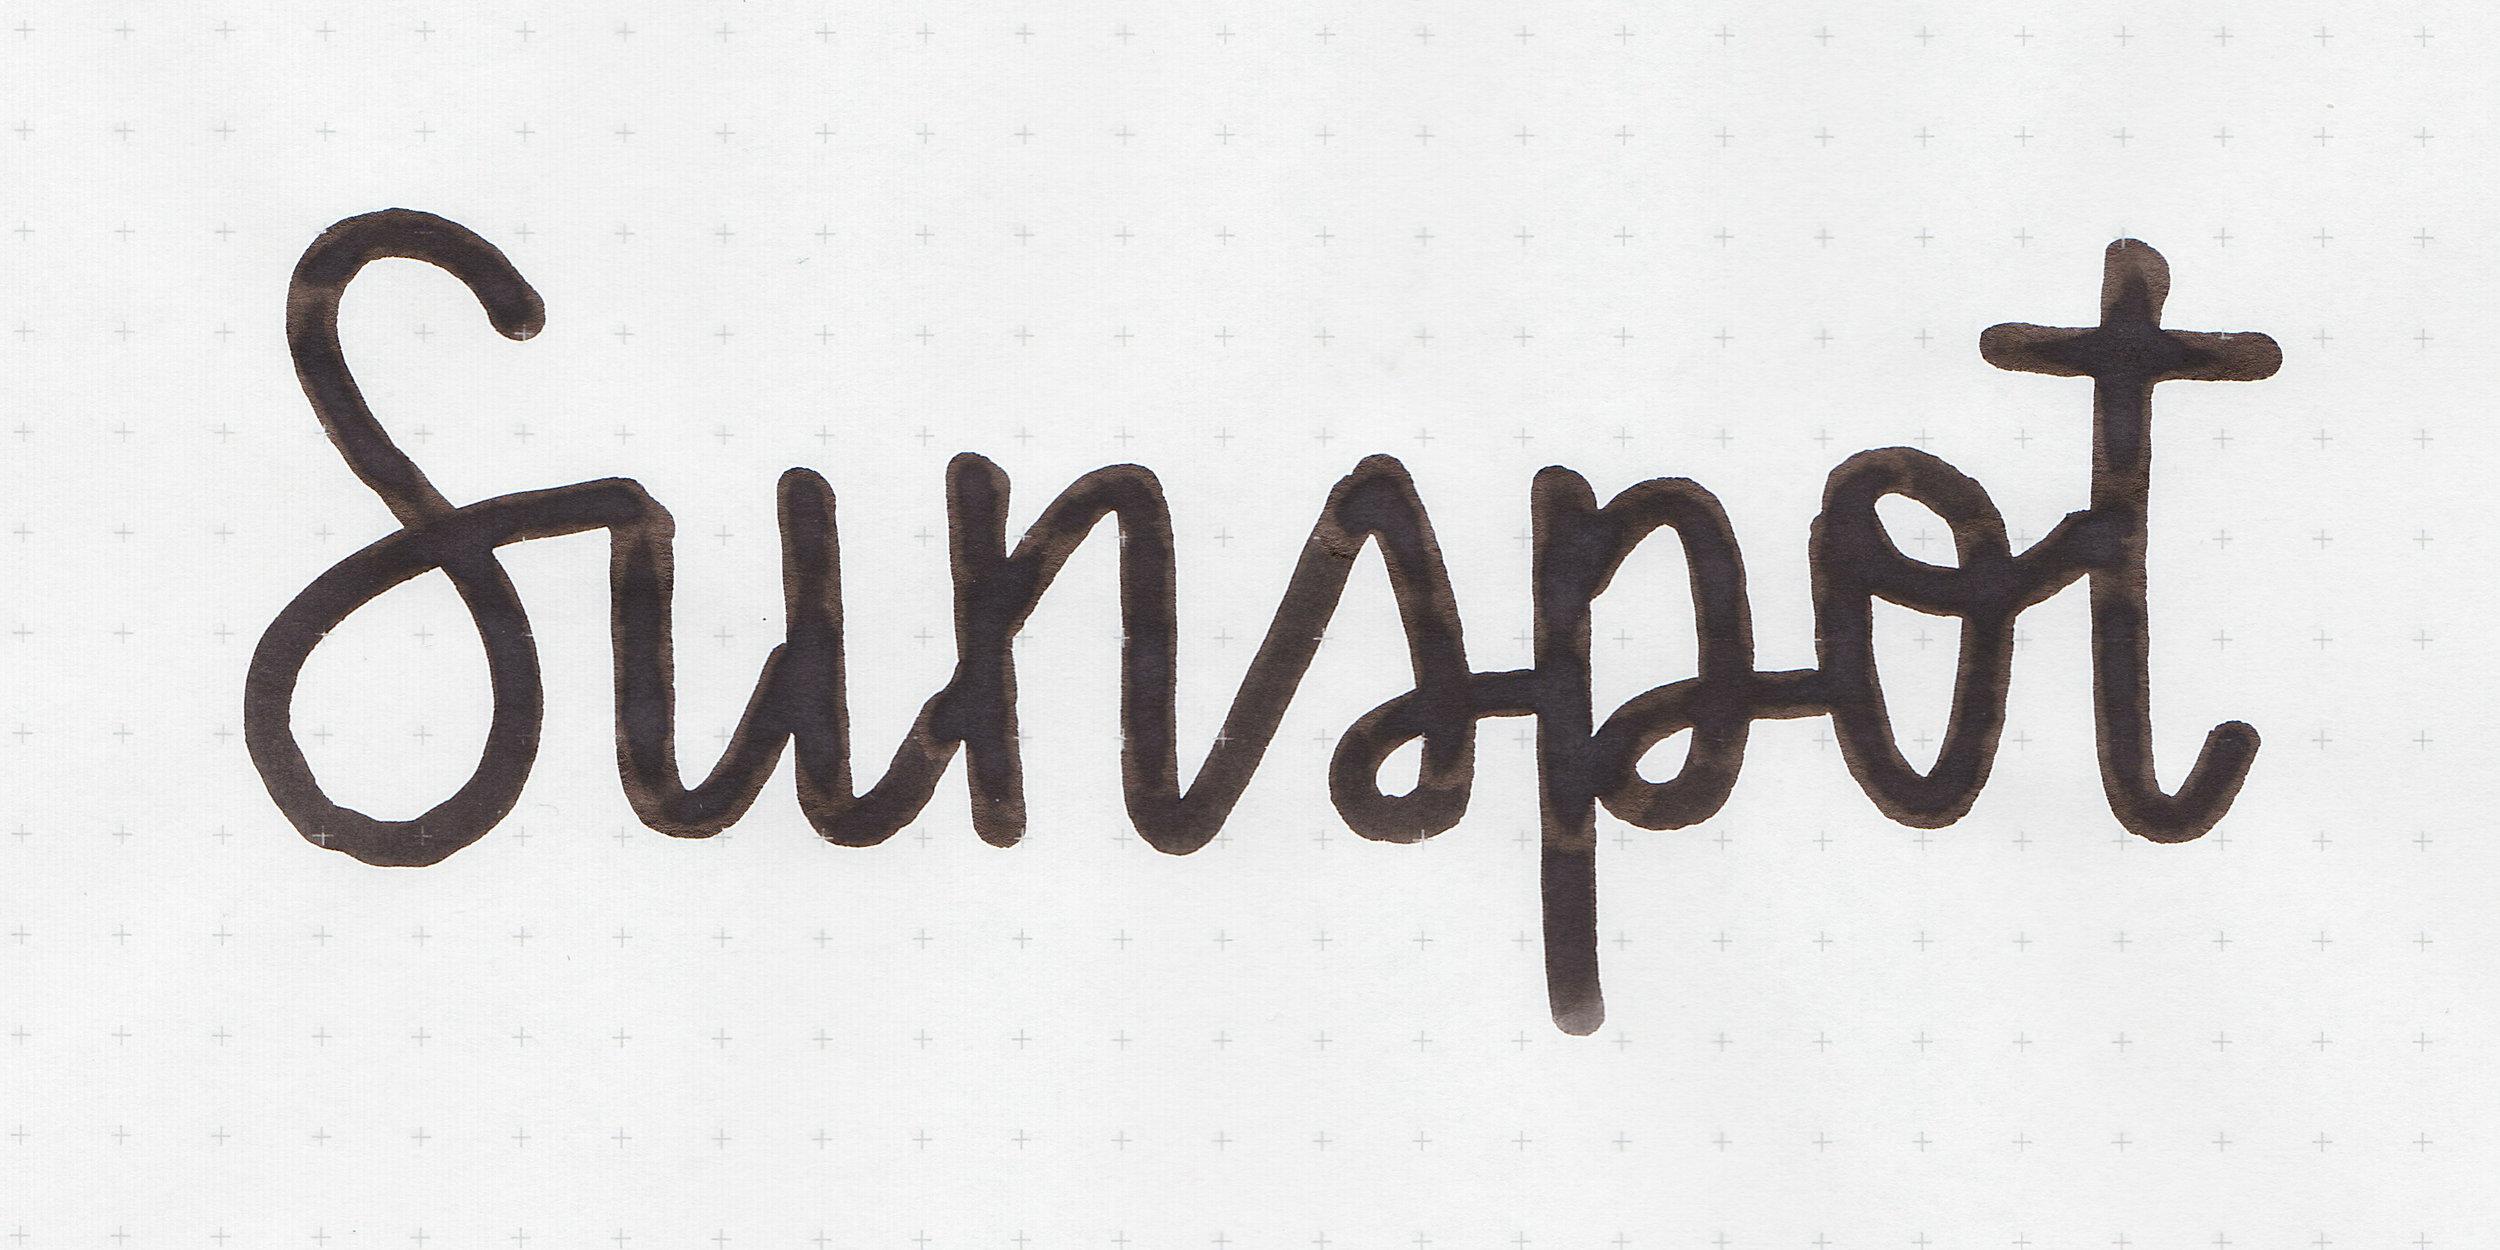 cv-sunspot-4.jpg